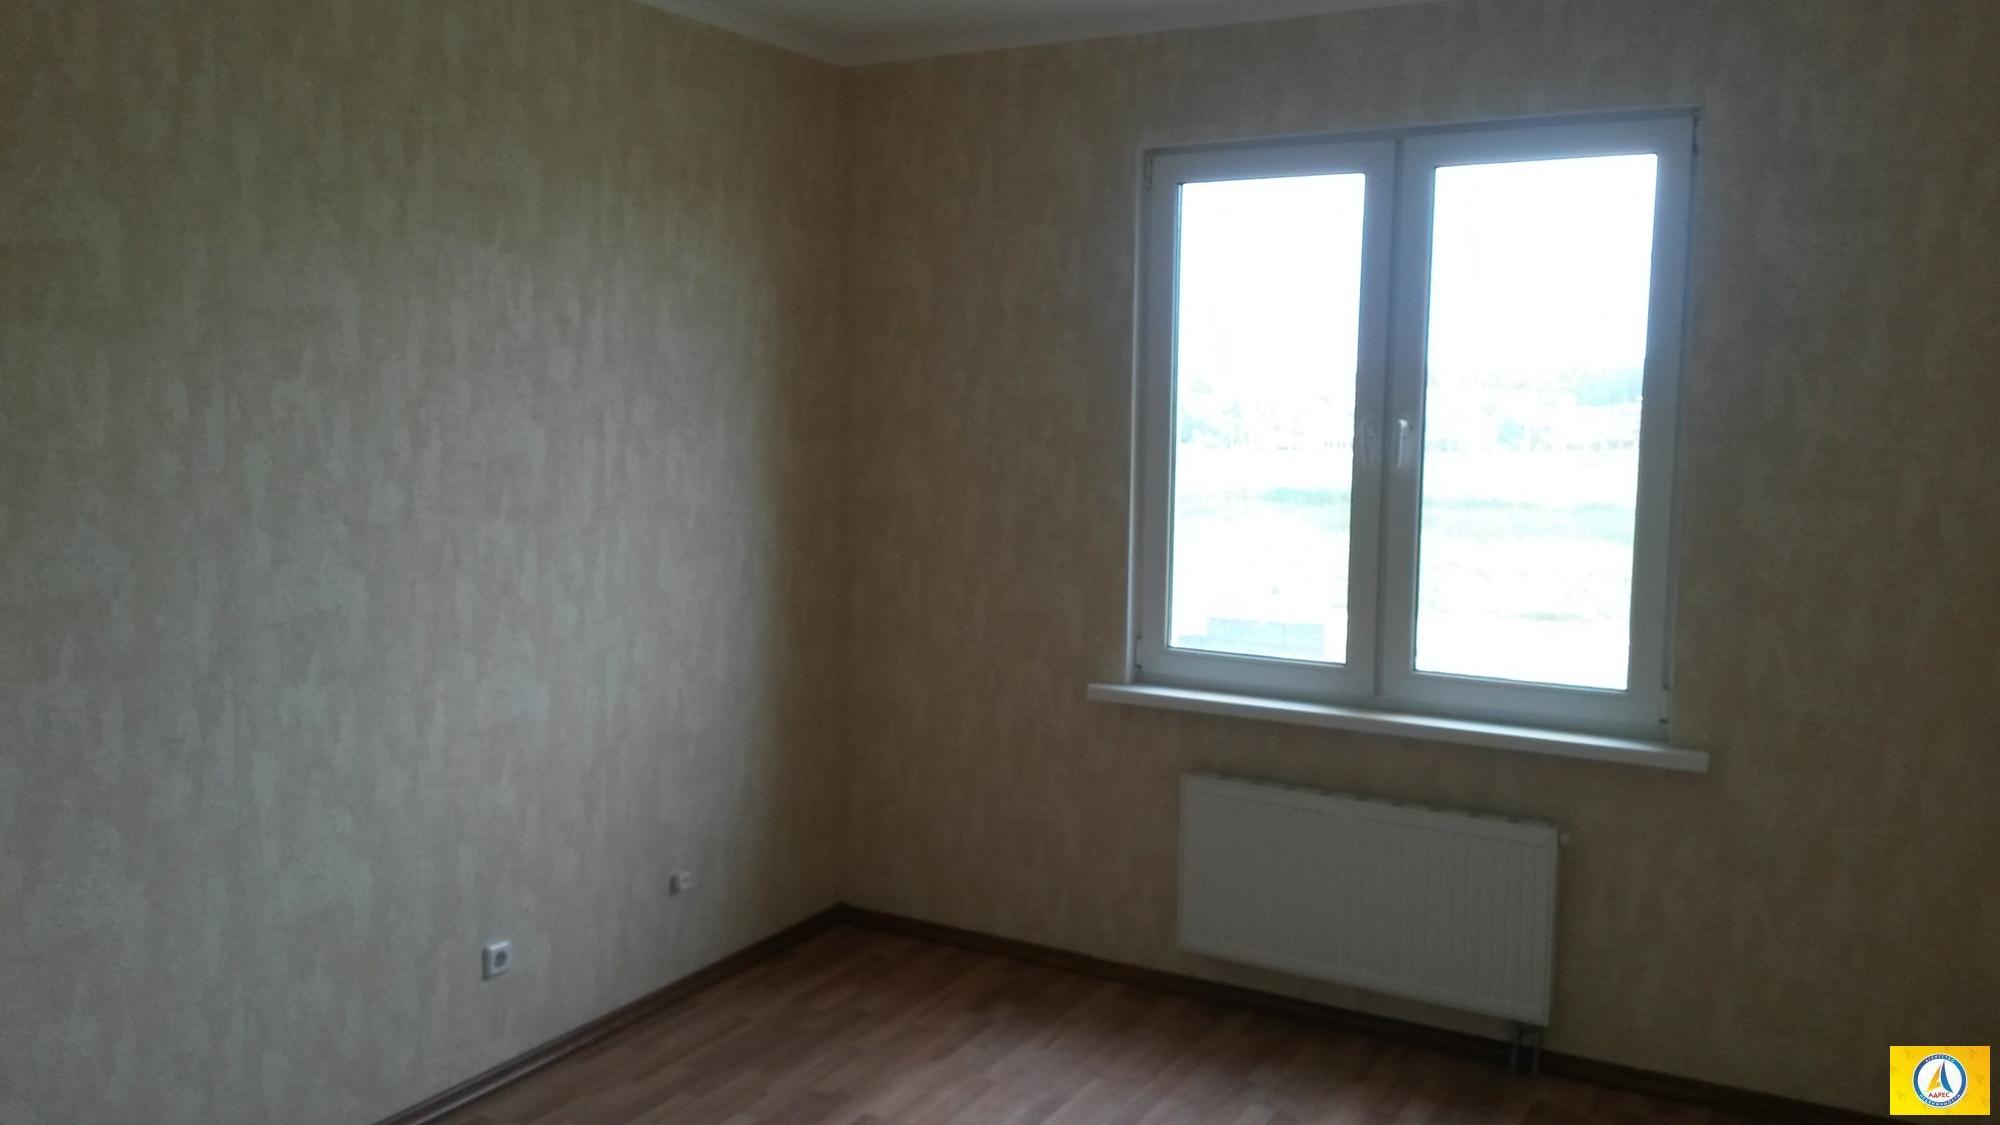 Домодедово, 1-но комнатная квартира, курыжова д.13, 300000.